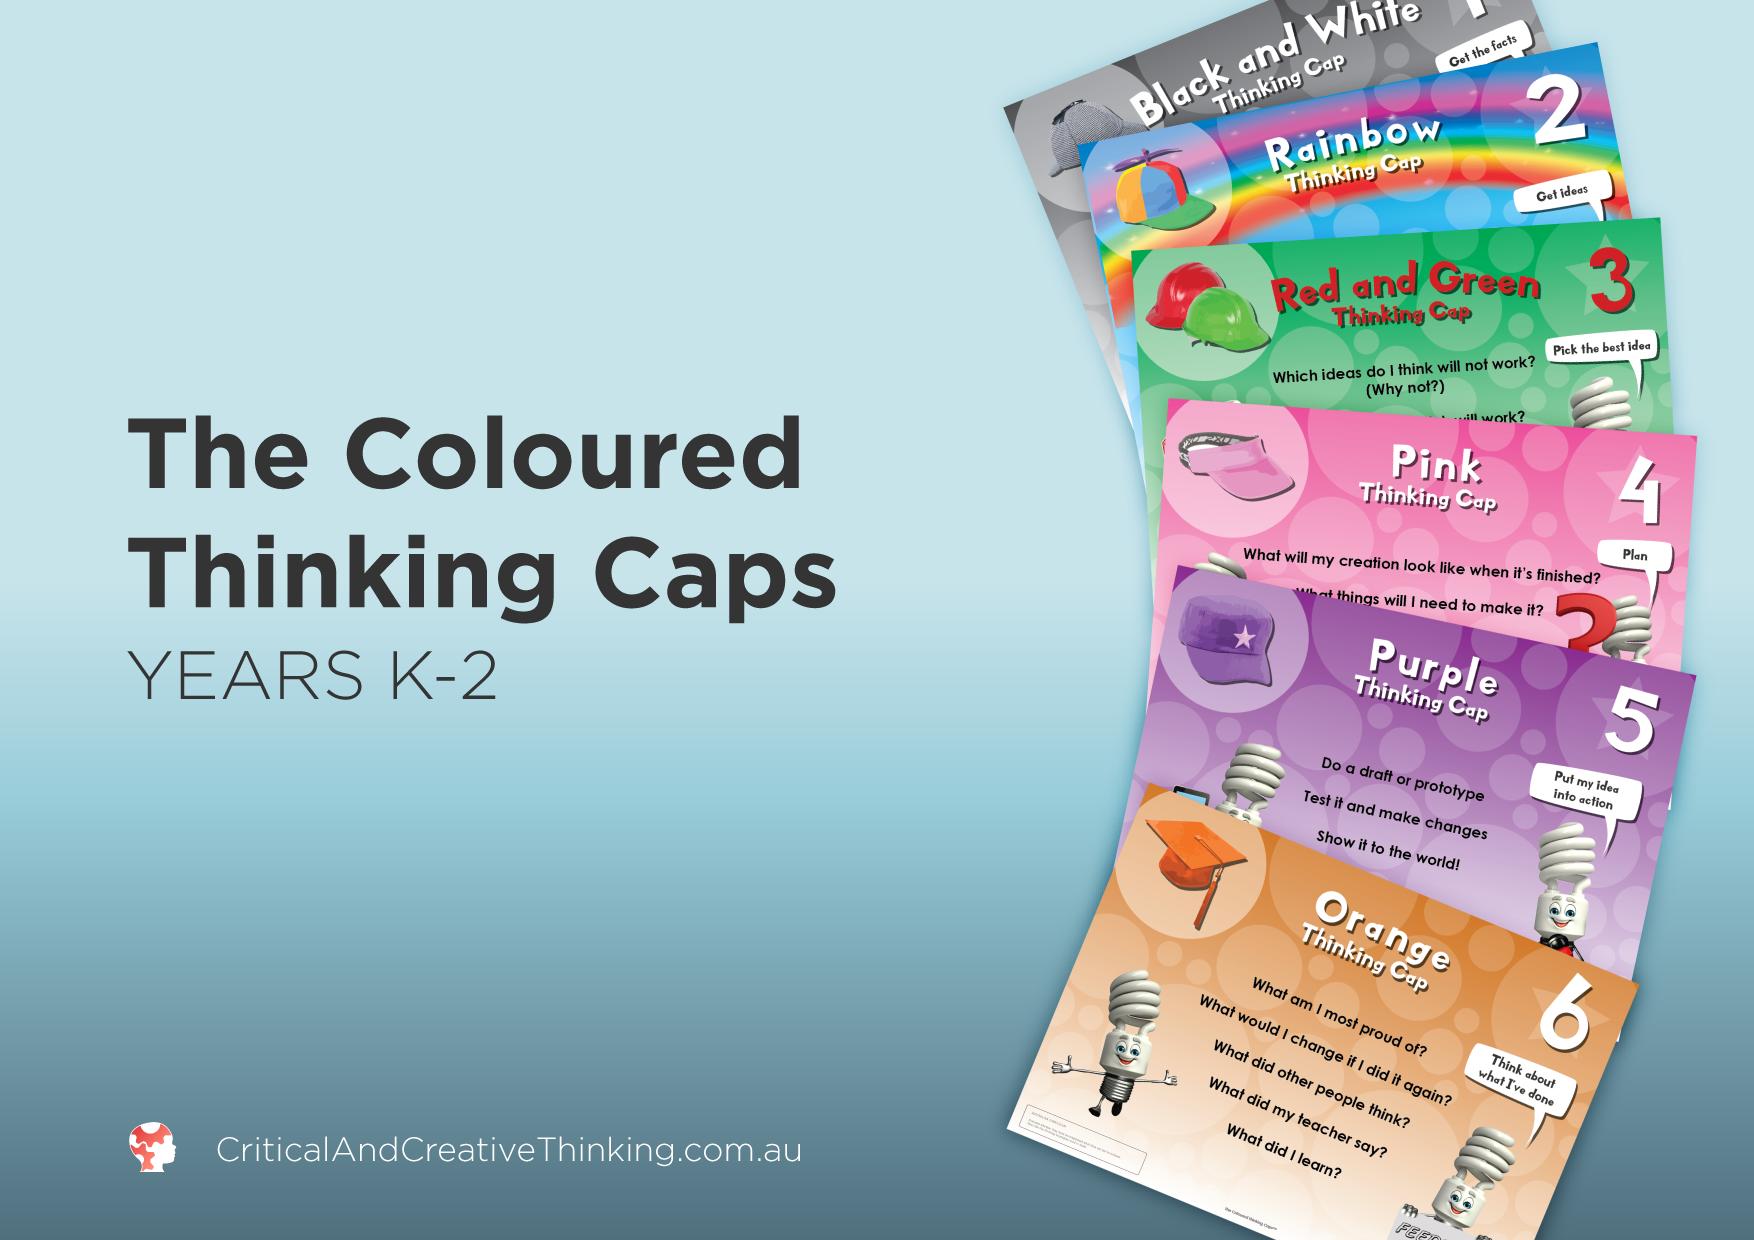 CCT coloured thinking caps year K-2 Foundation